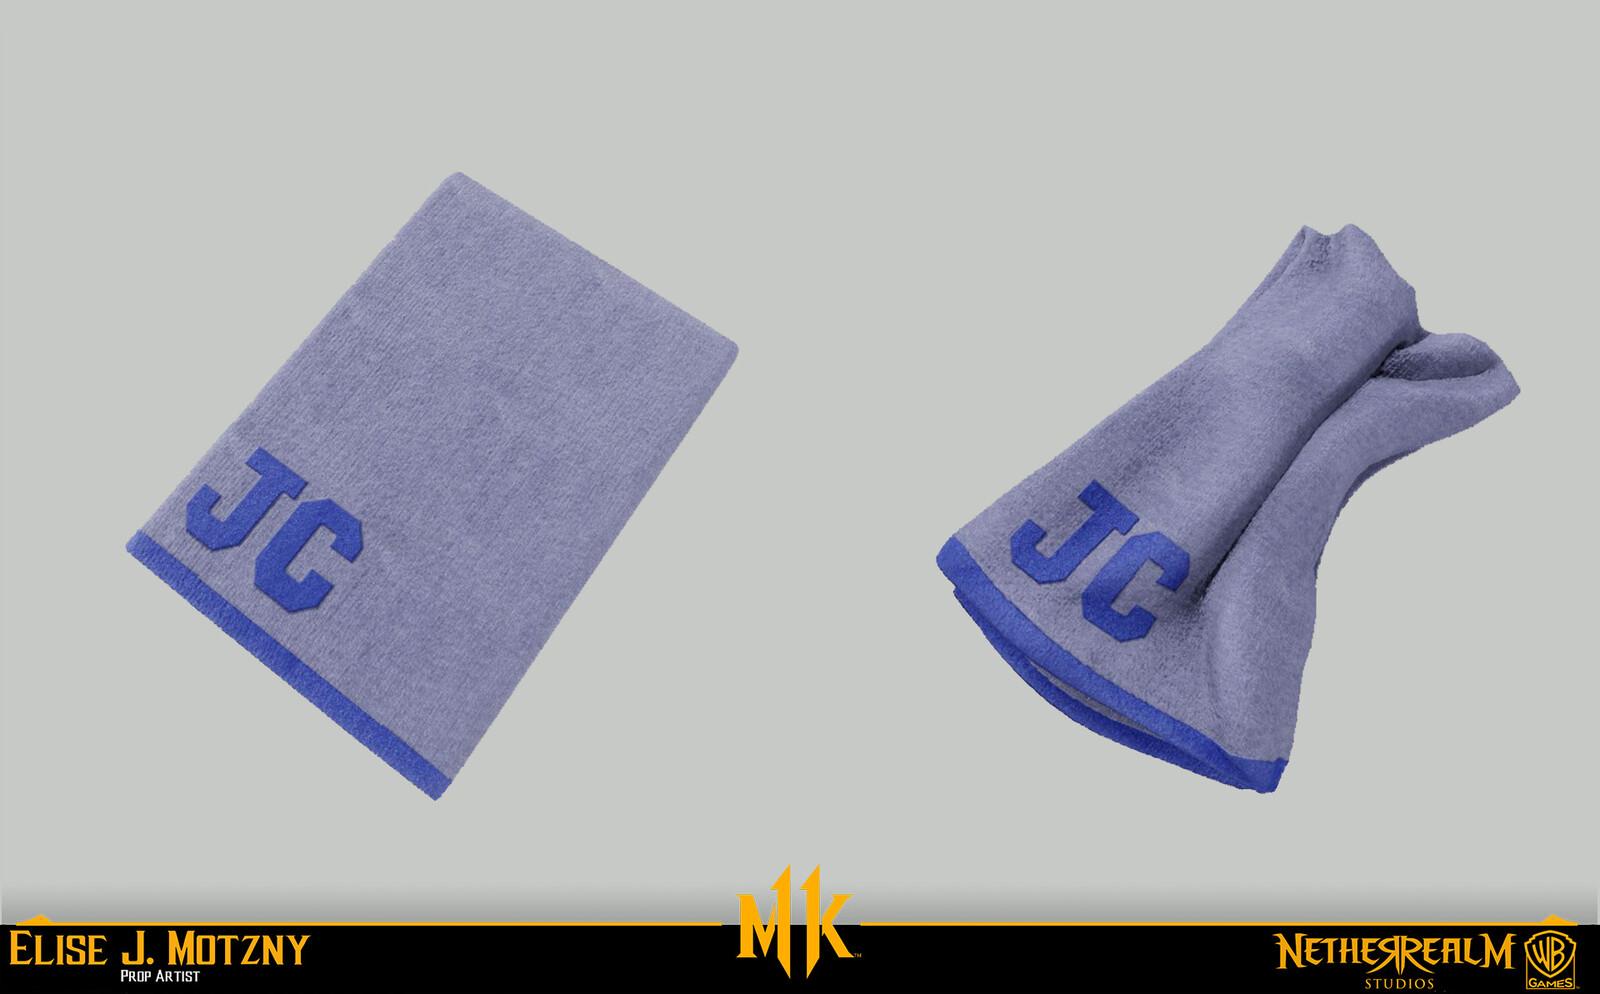 Sculpted warped towel in ZB